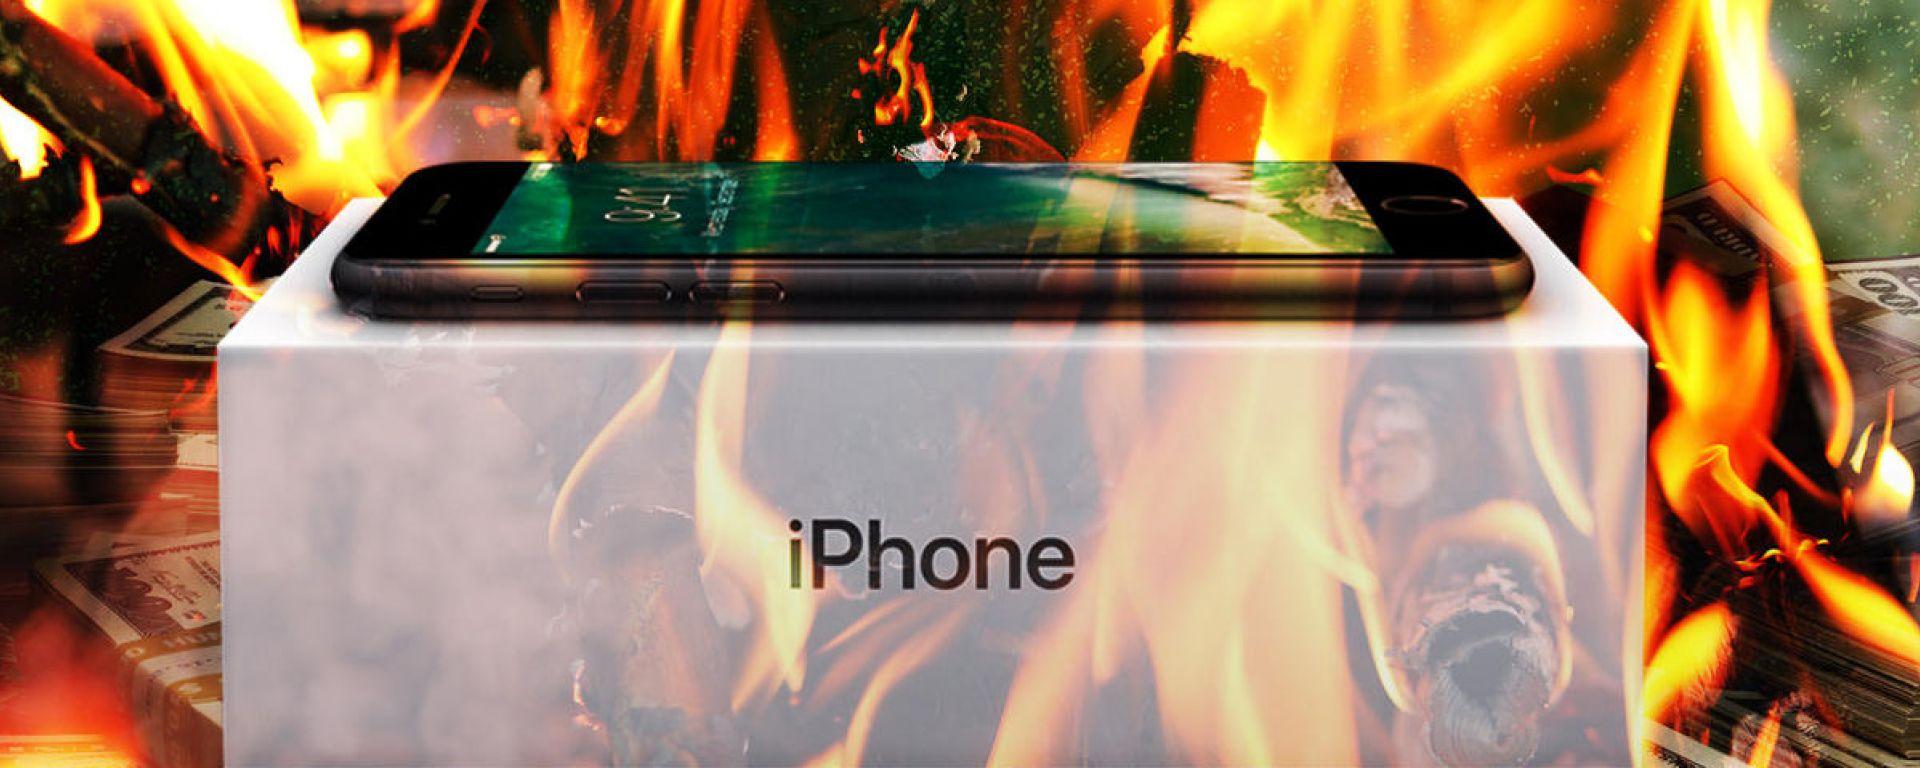 Iphone esplode, Jeep Cherokee va a fuoco